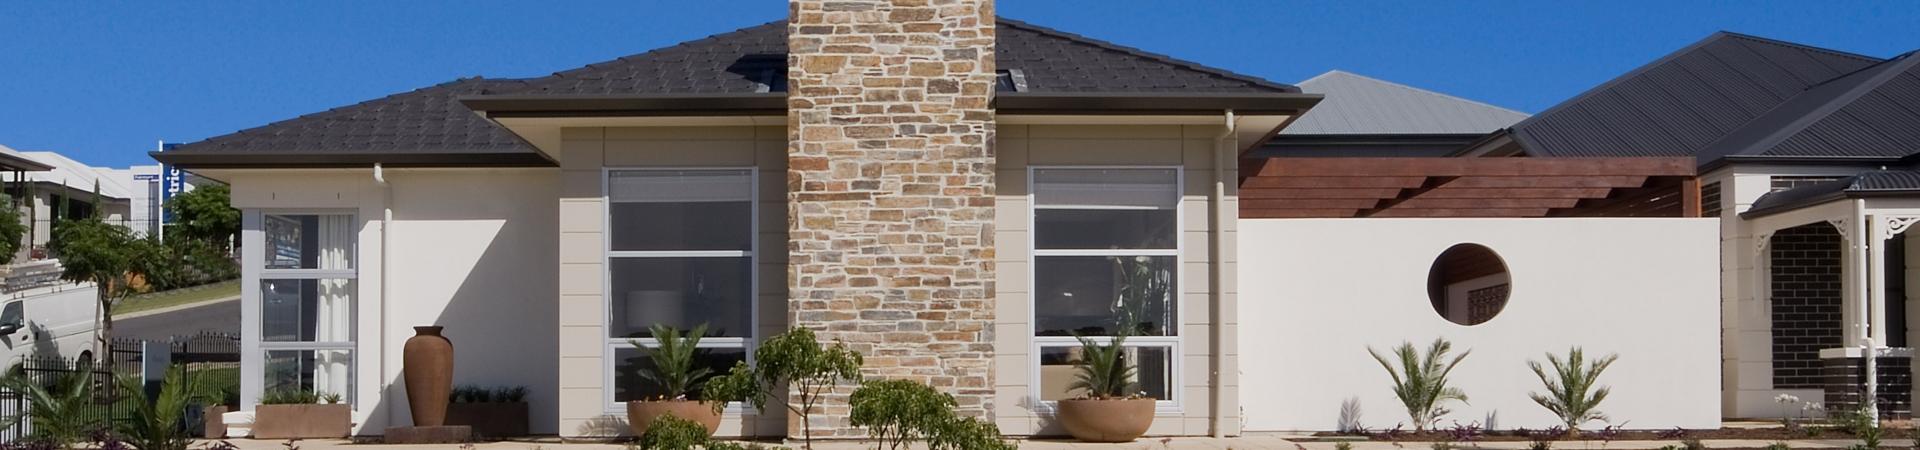 Bluestone Mt Barker Rossdale Homes Rossdale Homes